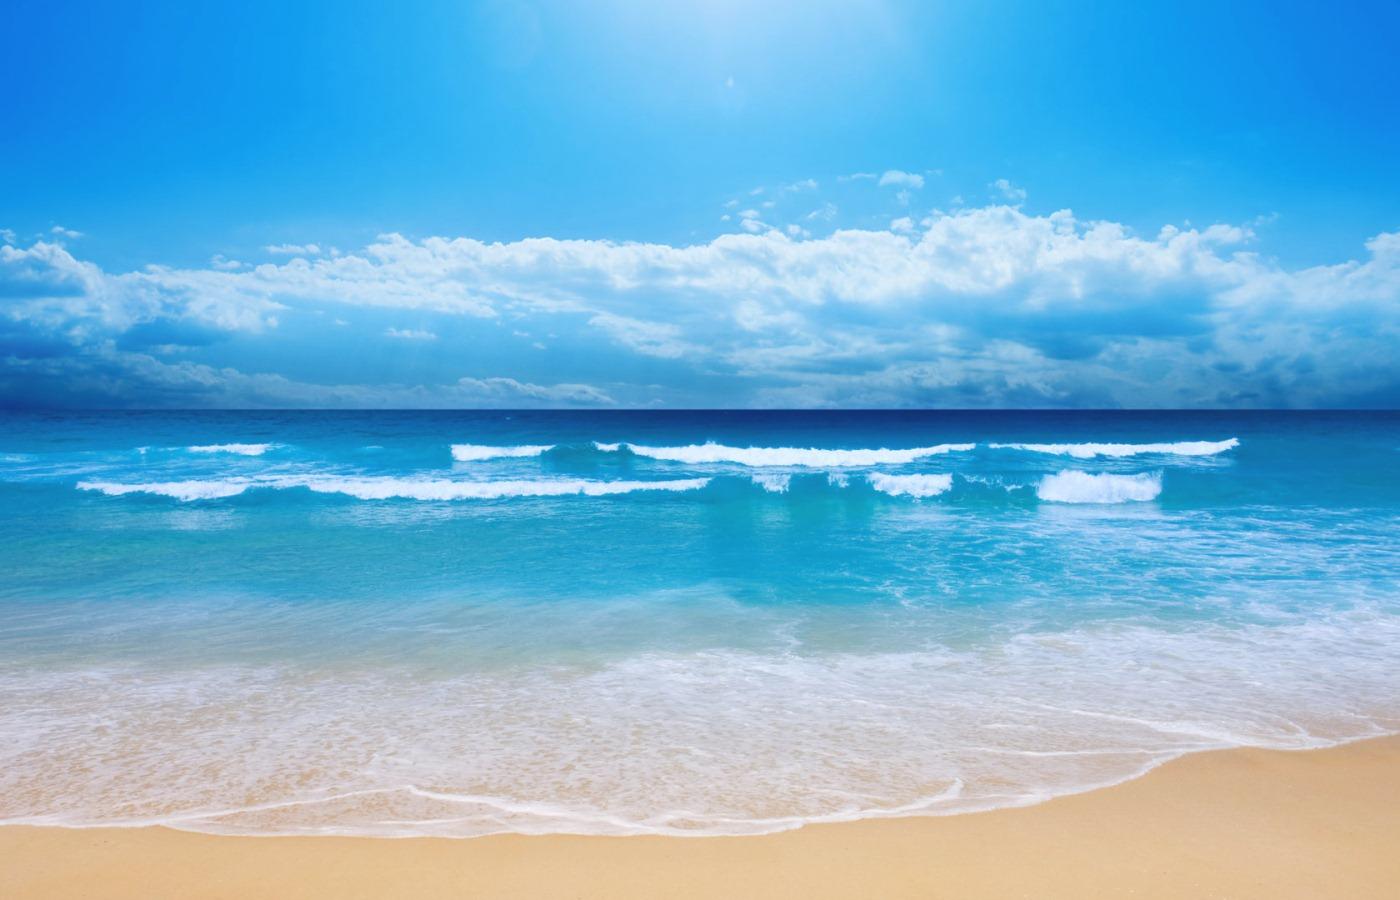 FranceMediaGroup-beach.jpg